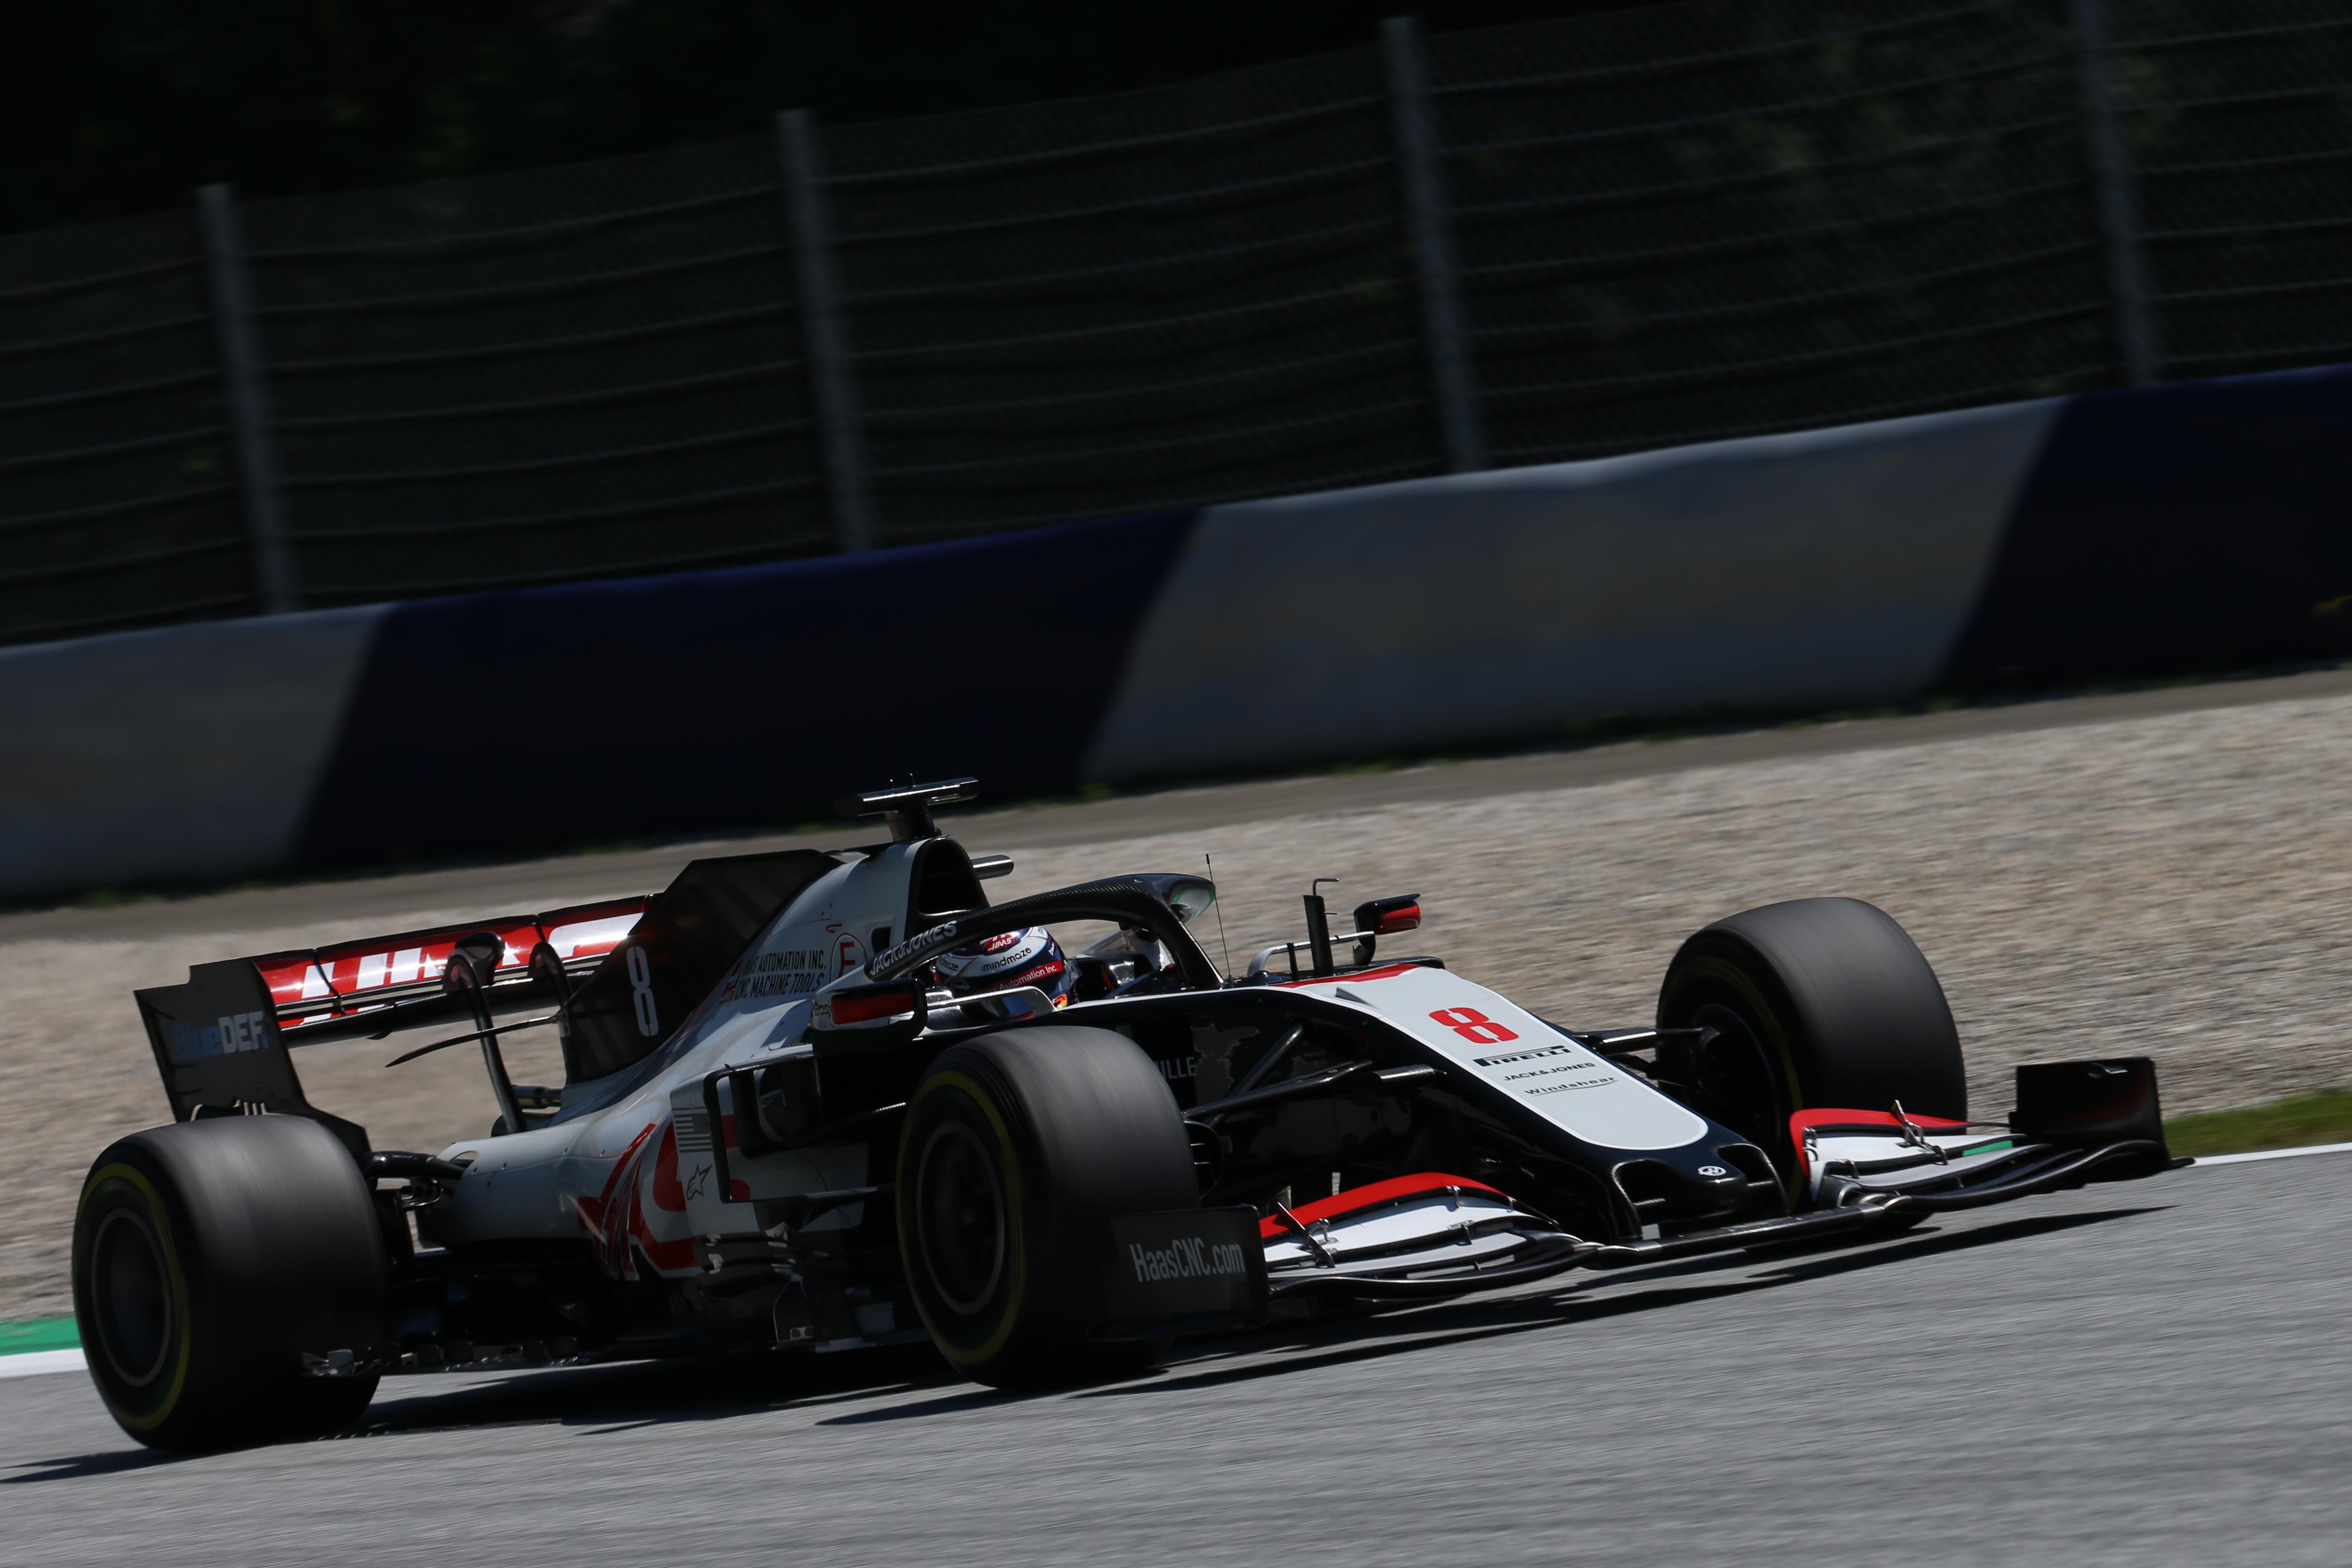 Romain Grosjean Haas Styrian Grand Prix 2020